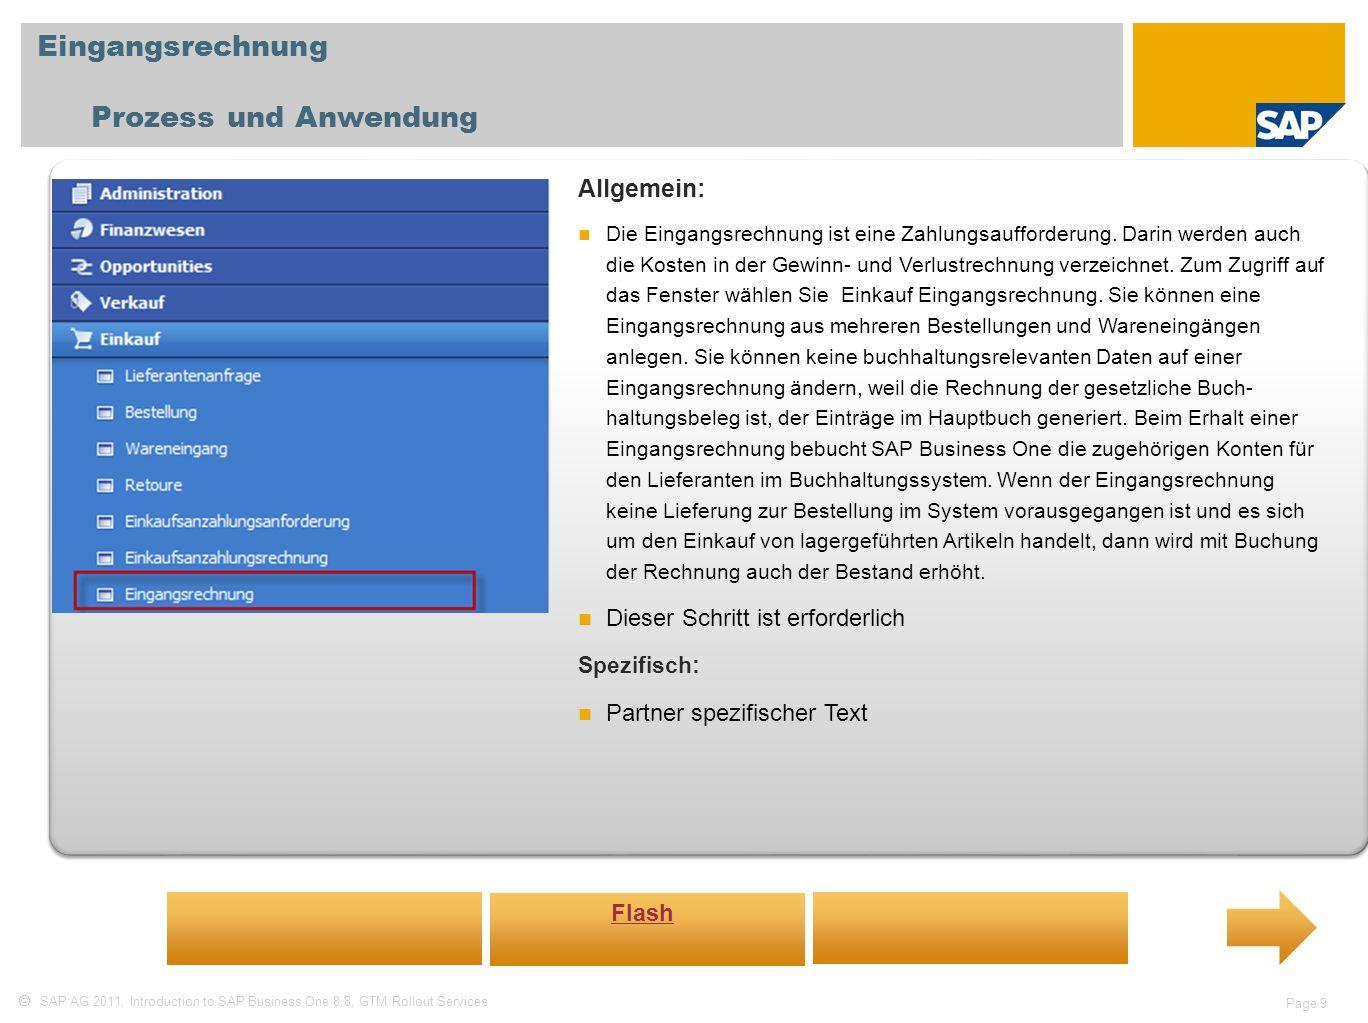 SAP AG 2011, Introduction to SAP Business One 8.8, GTM Rollout Services Page 9 Eingangsrechnung Prozess und Anwendung Allgemein: Die Eingangsrechnung